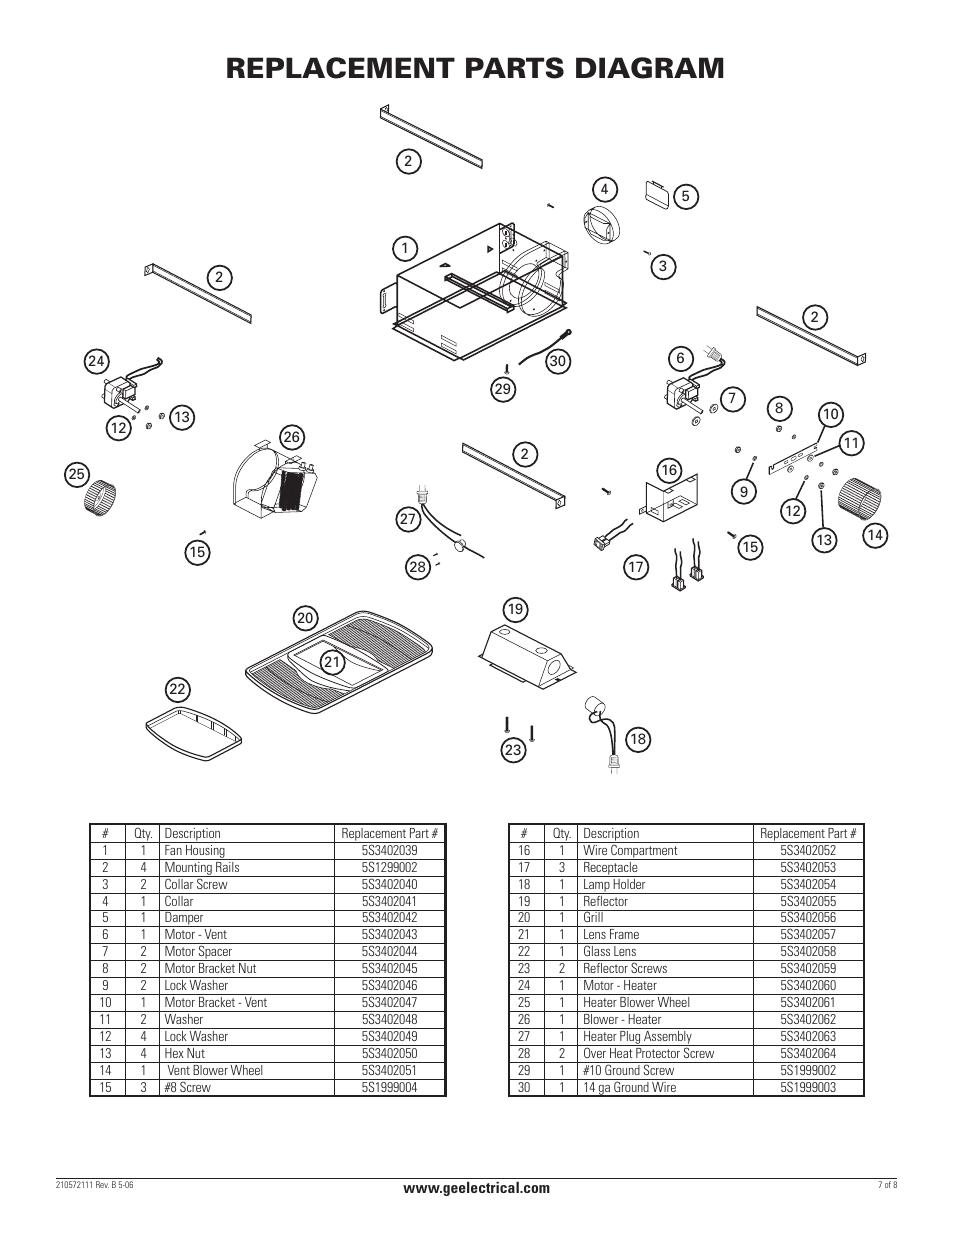 Replacement parts diagram | GE BFLH70L User Manual | Page 7 / 8